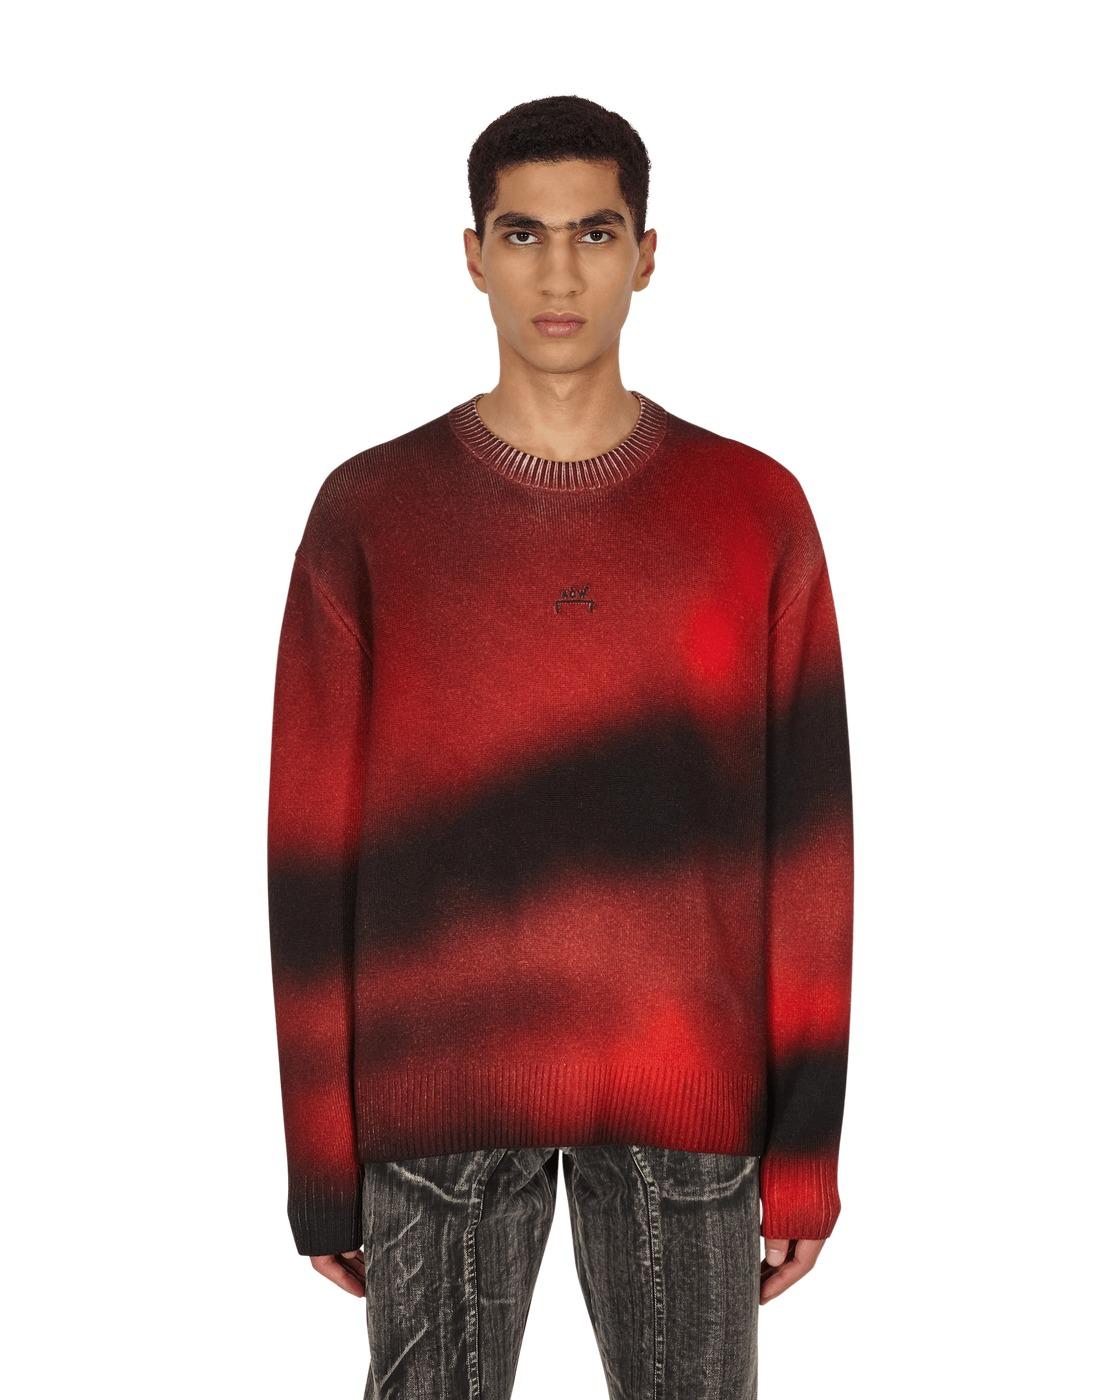 A Cold Wall Spray Digital Print Crewneck Sweater Print